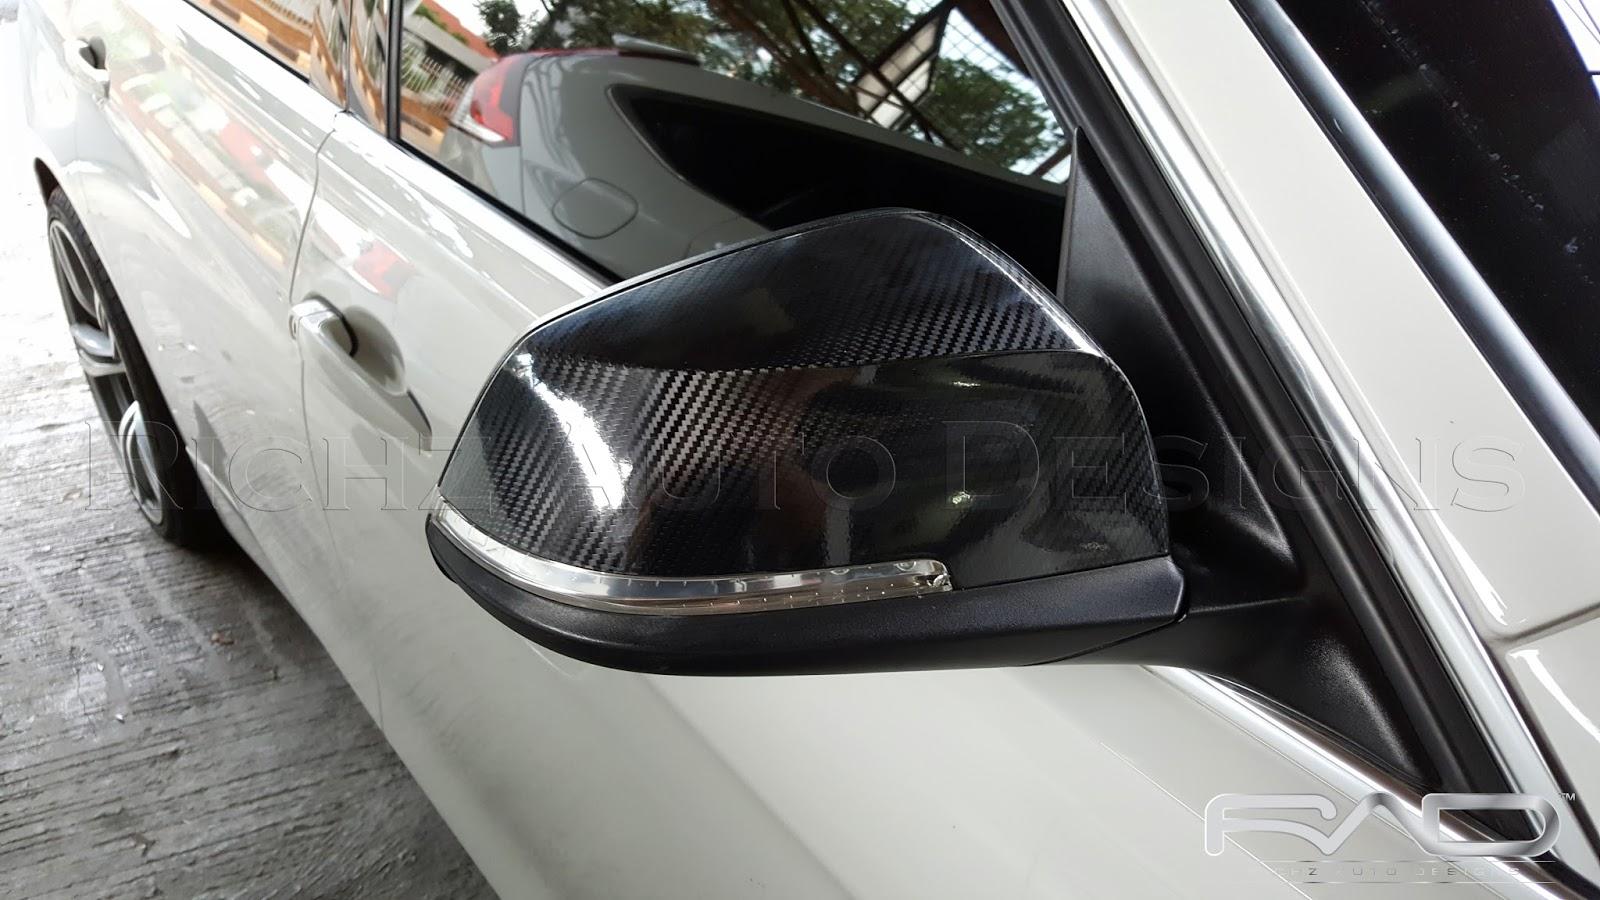 Jual Sticker Carbon Motor Nangguk Stiker Skotlet Karbon 5d Source Richz Auto Designs Glossy Really Look A Like